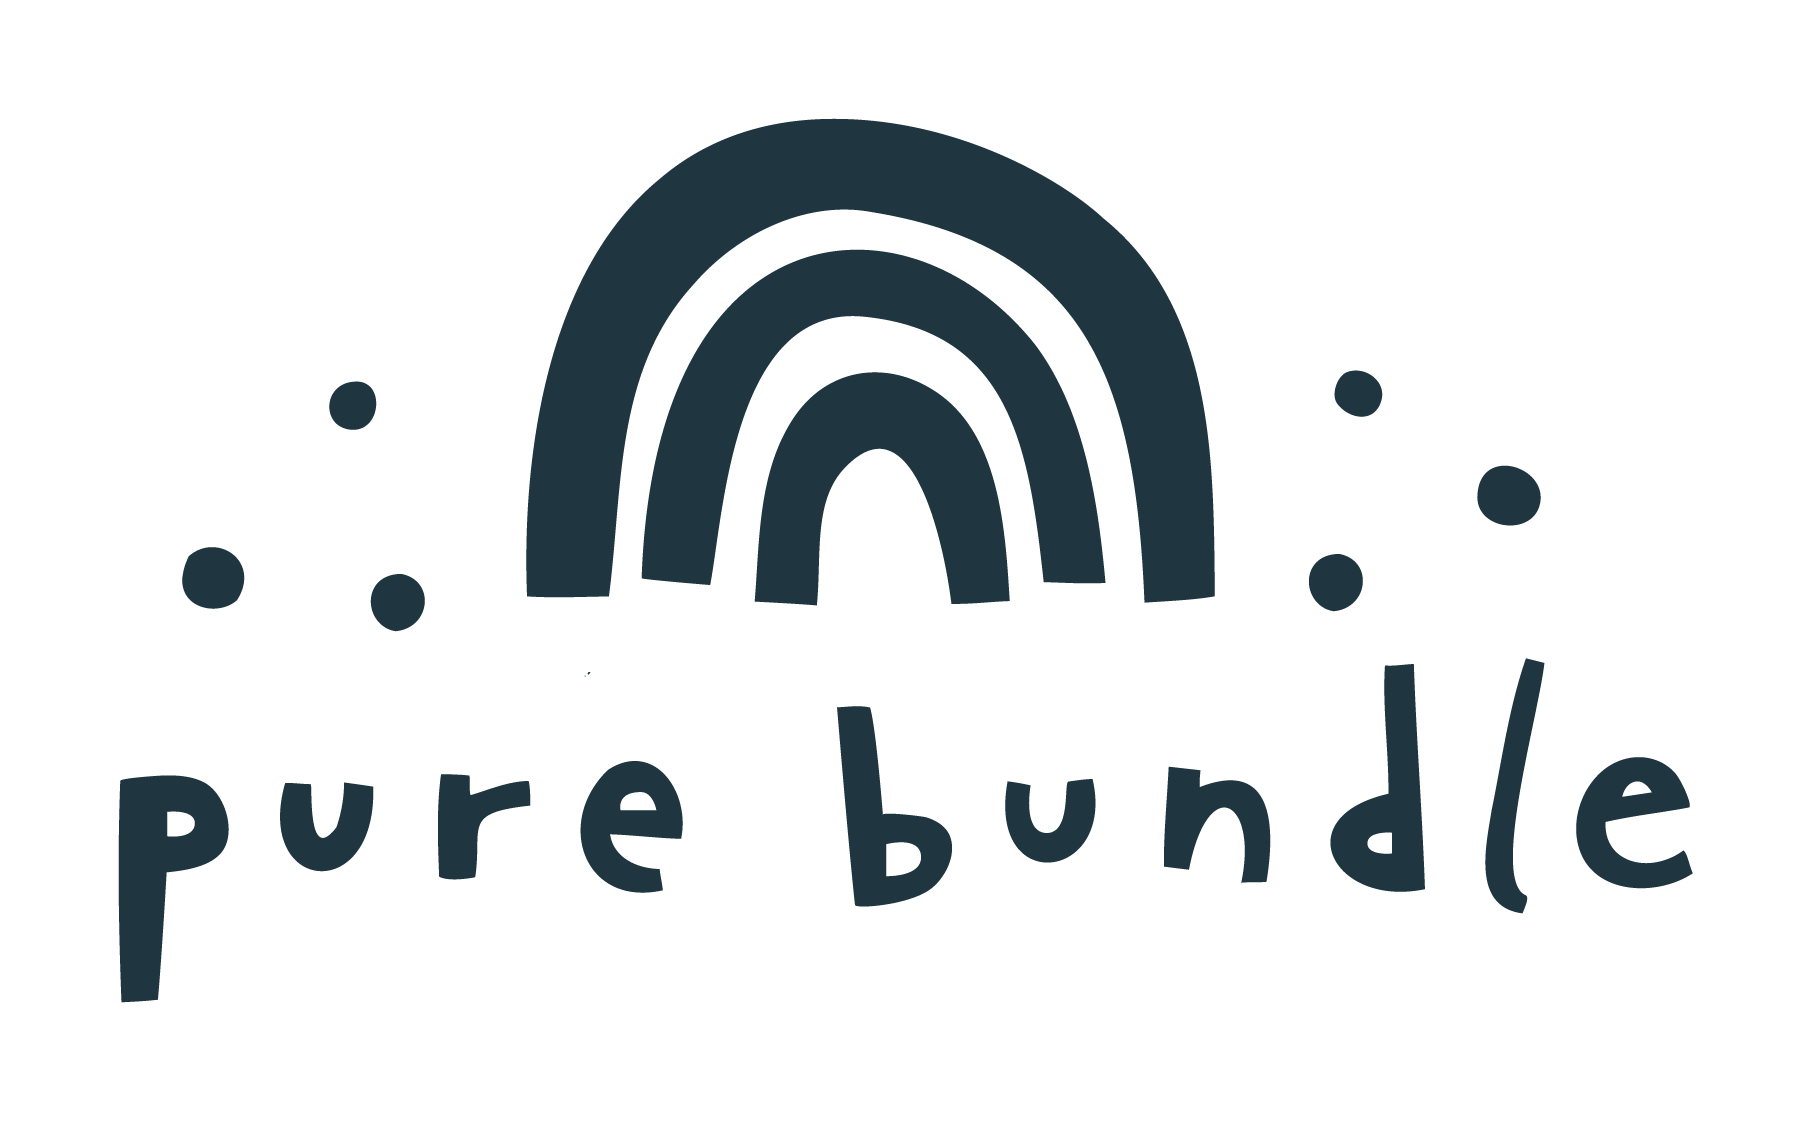 Pure Bundle